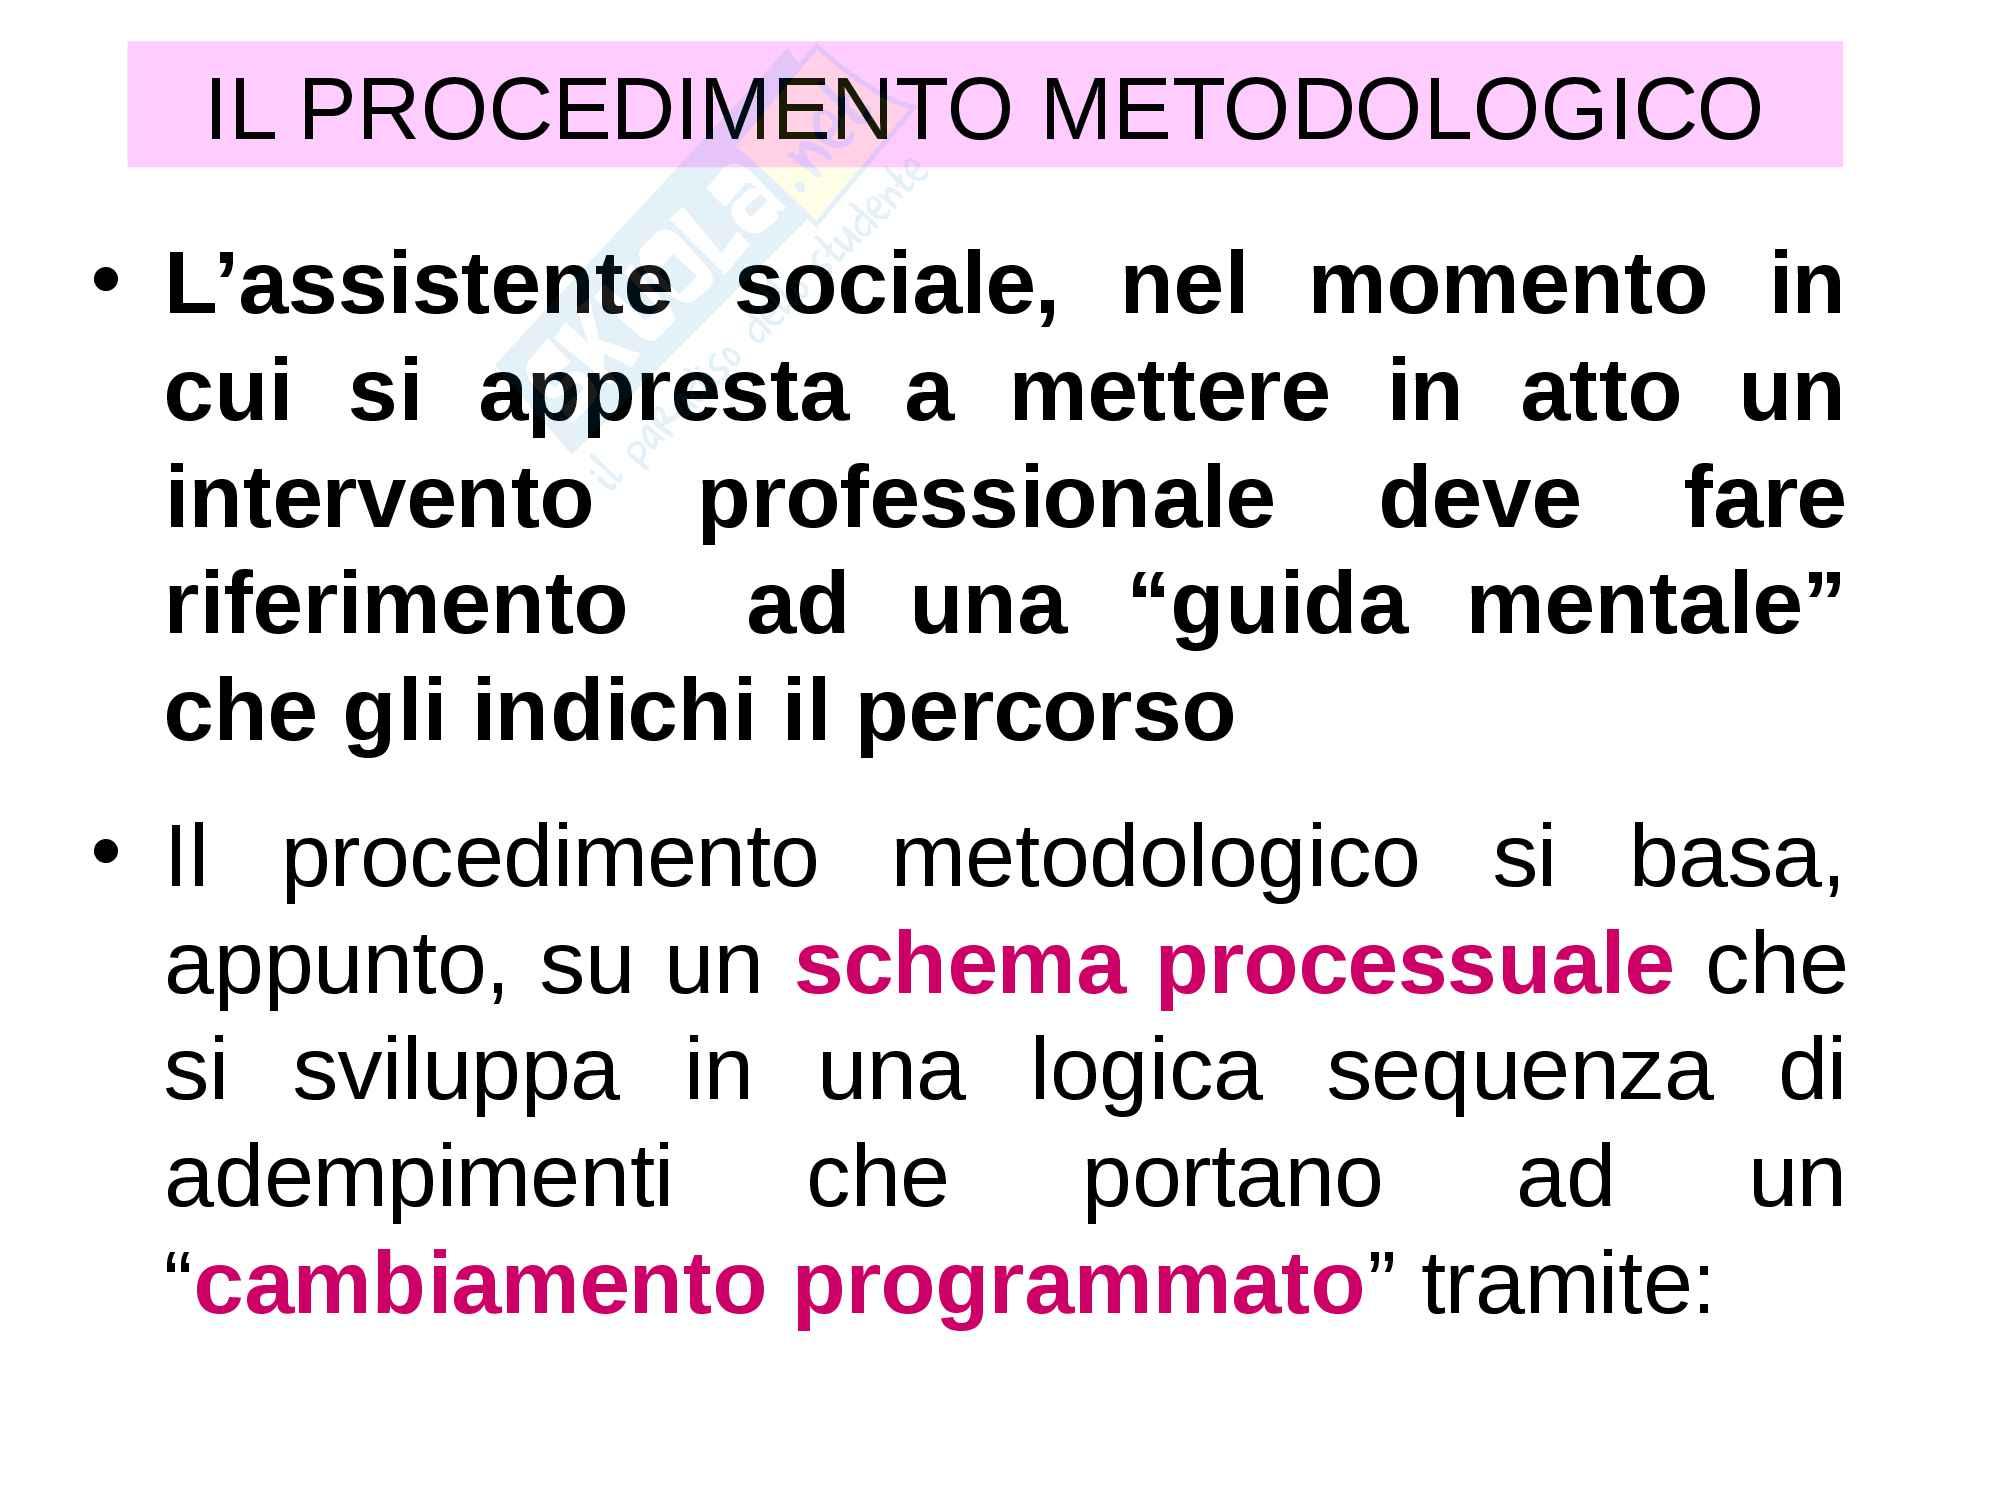 Procedimento metodologico